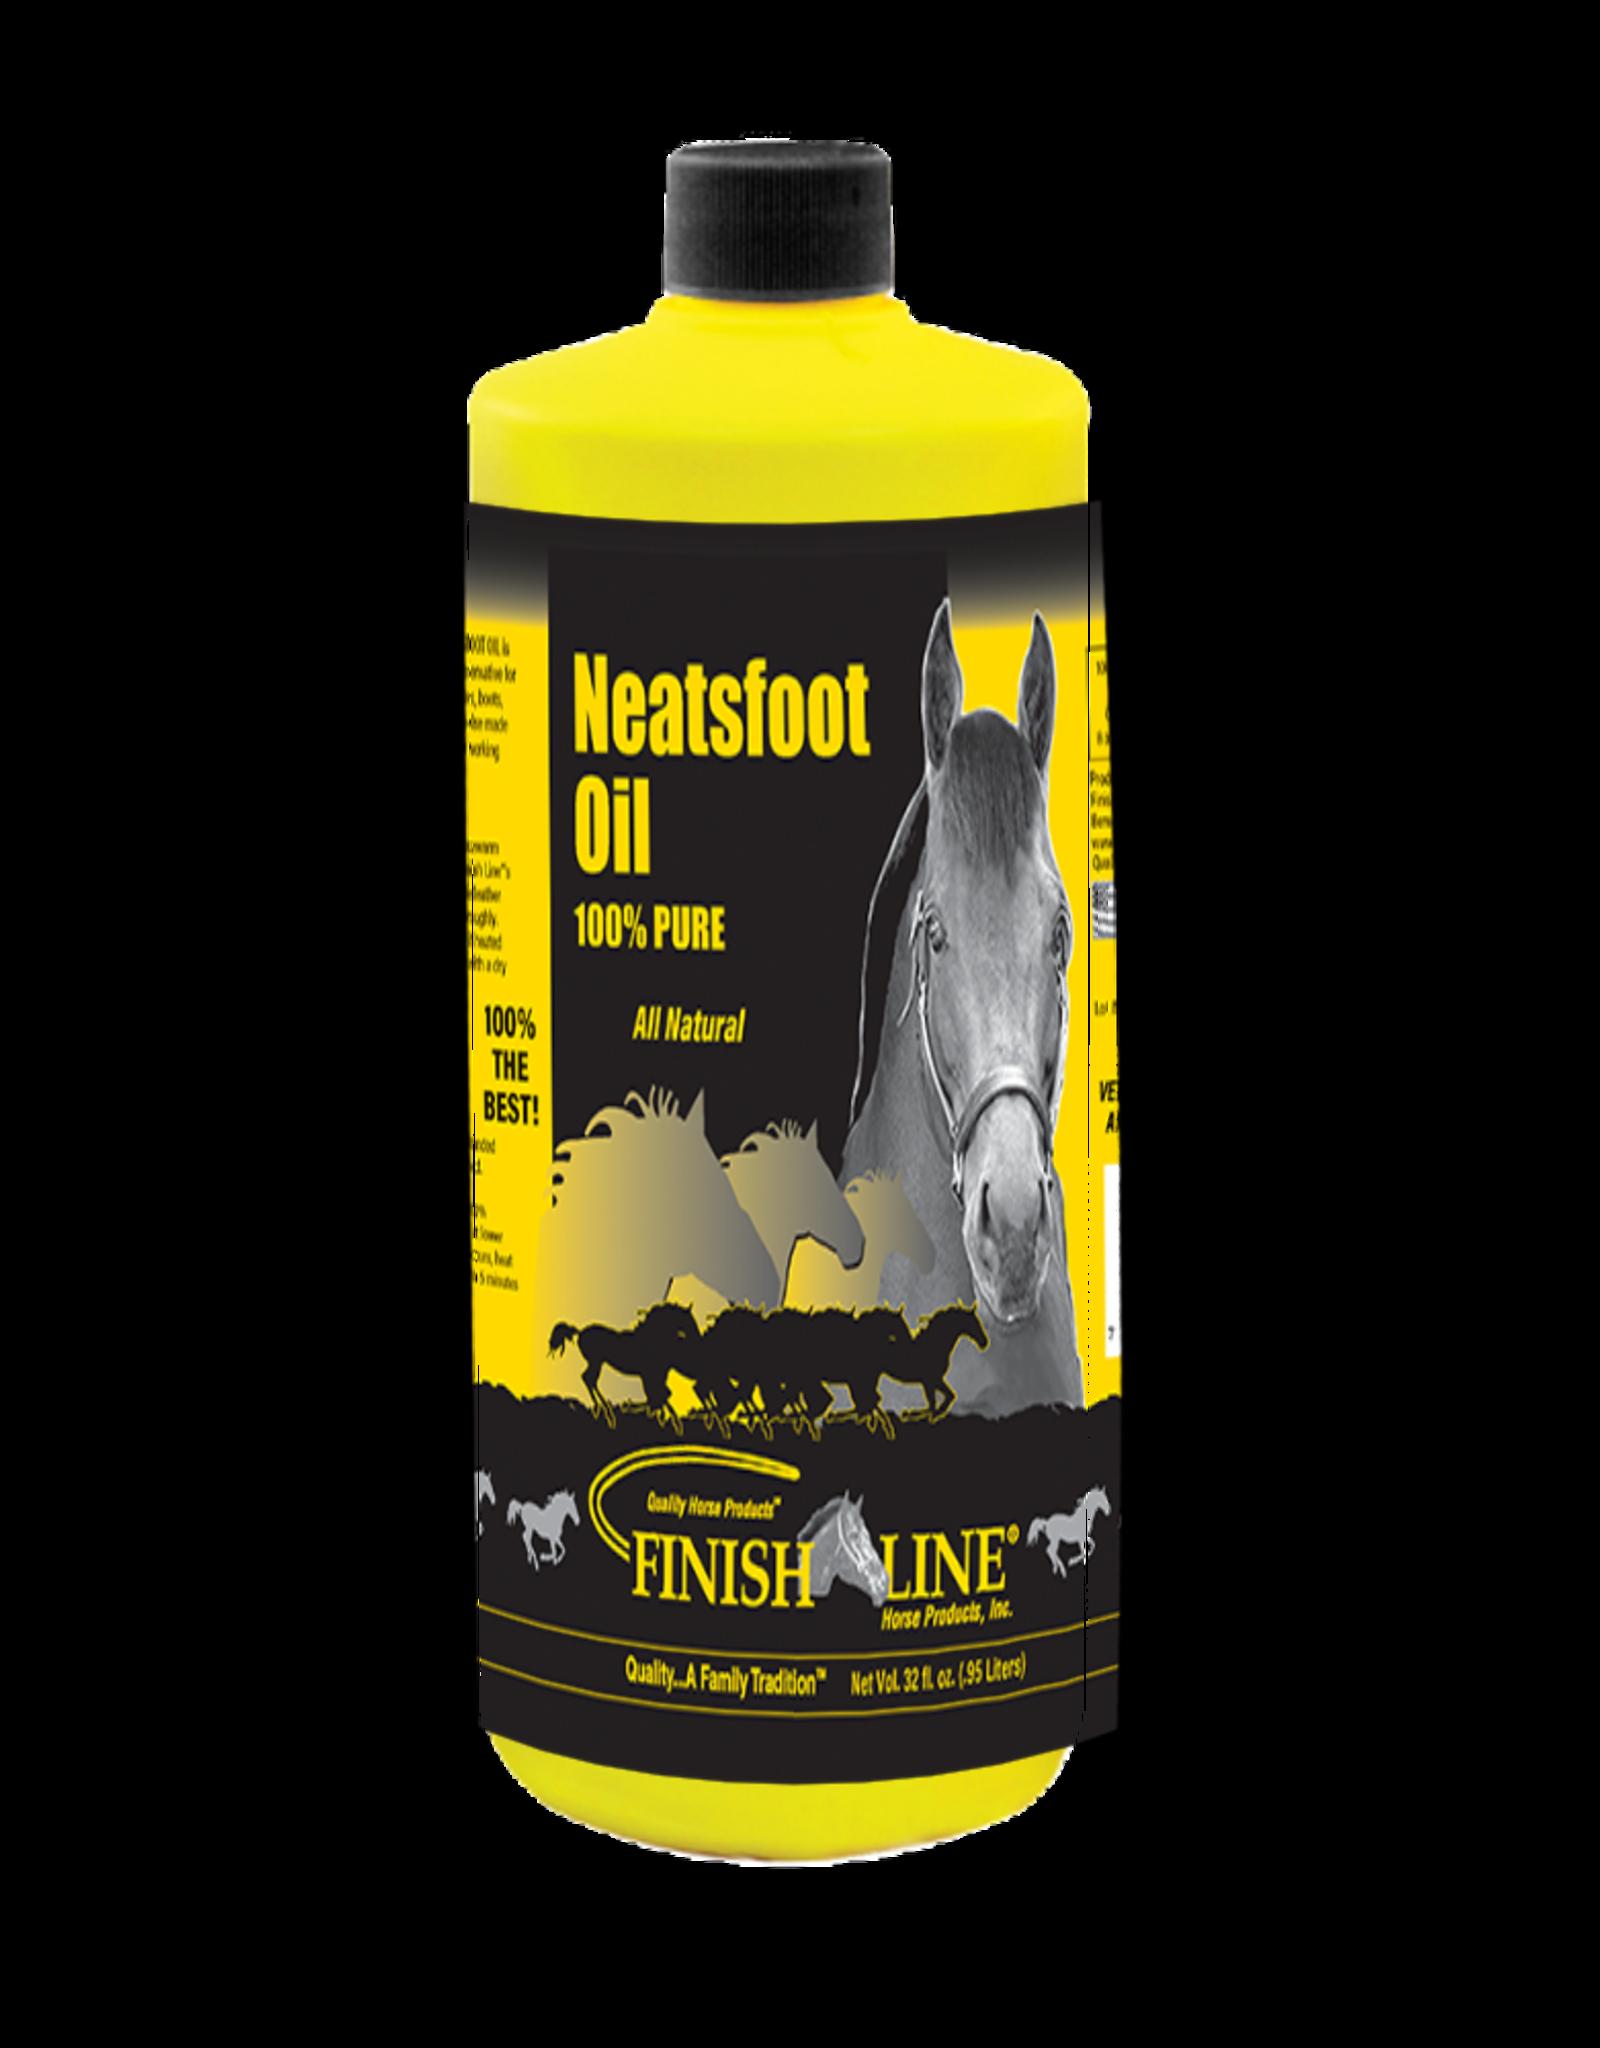 FINISHLINE Finish Line Neatsfoot Oil Pure 32oz